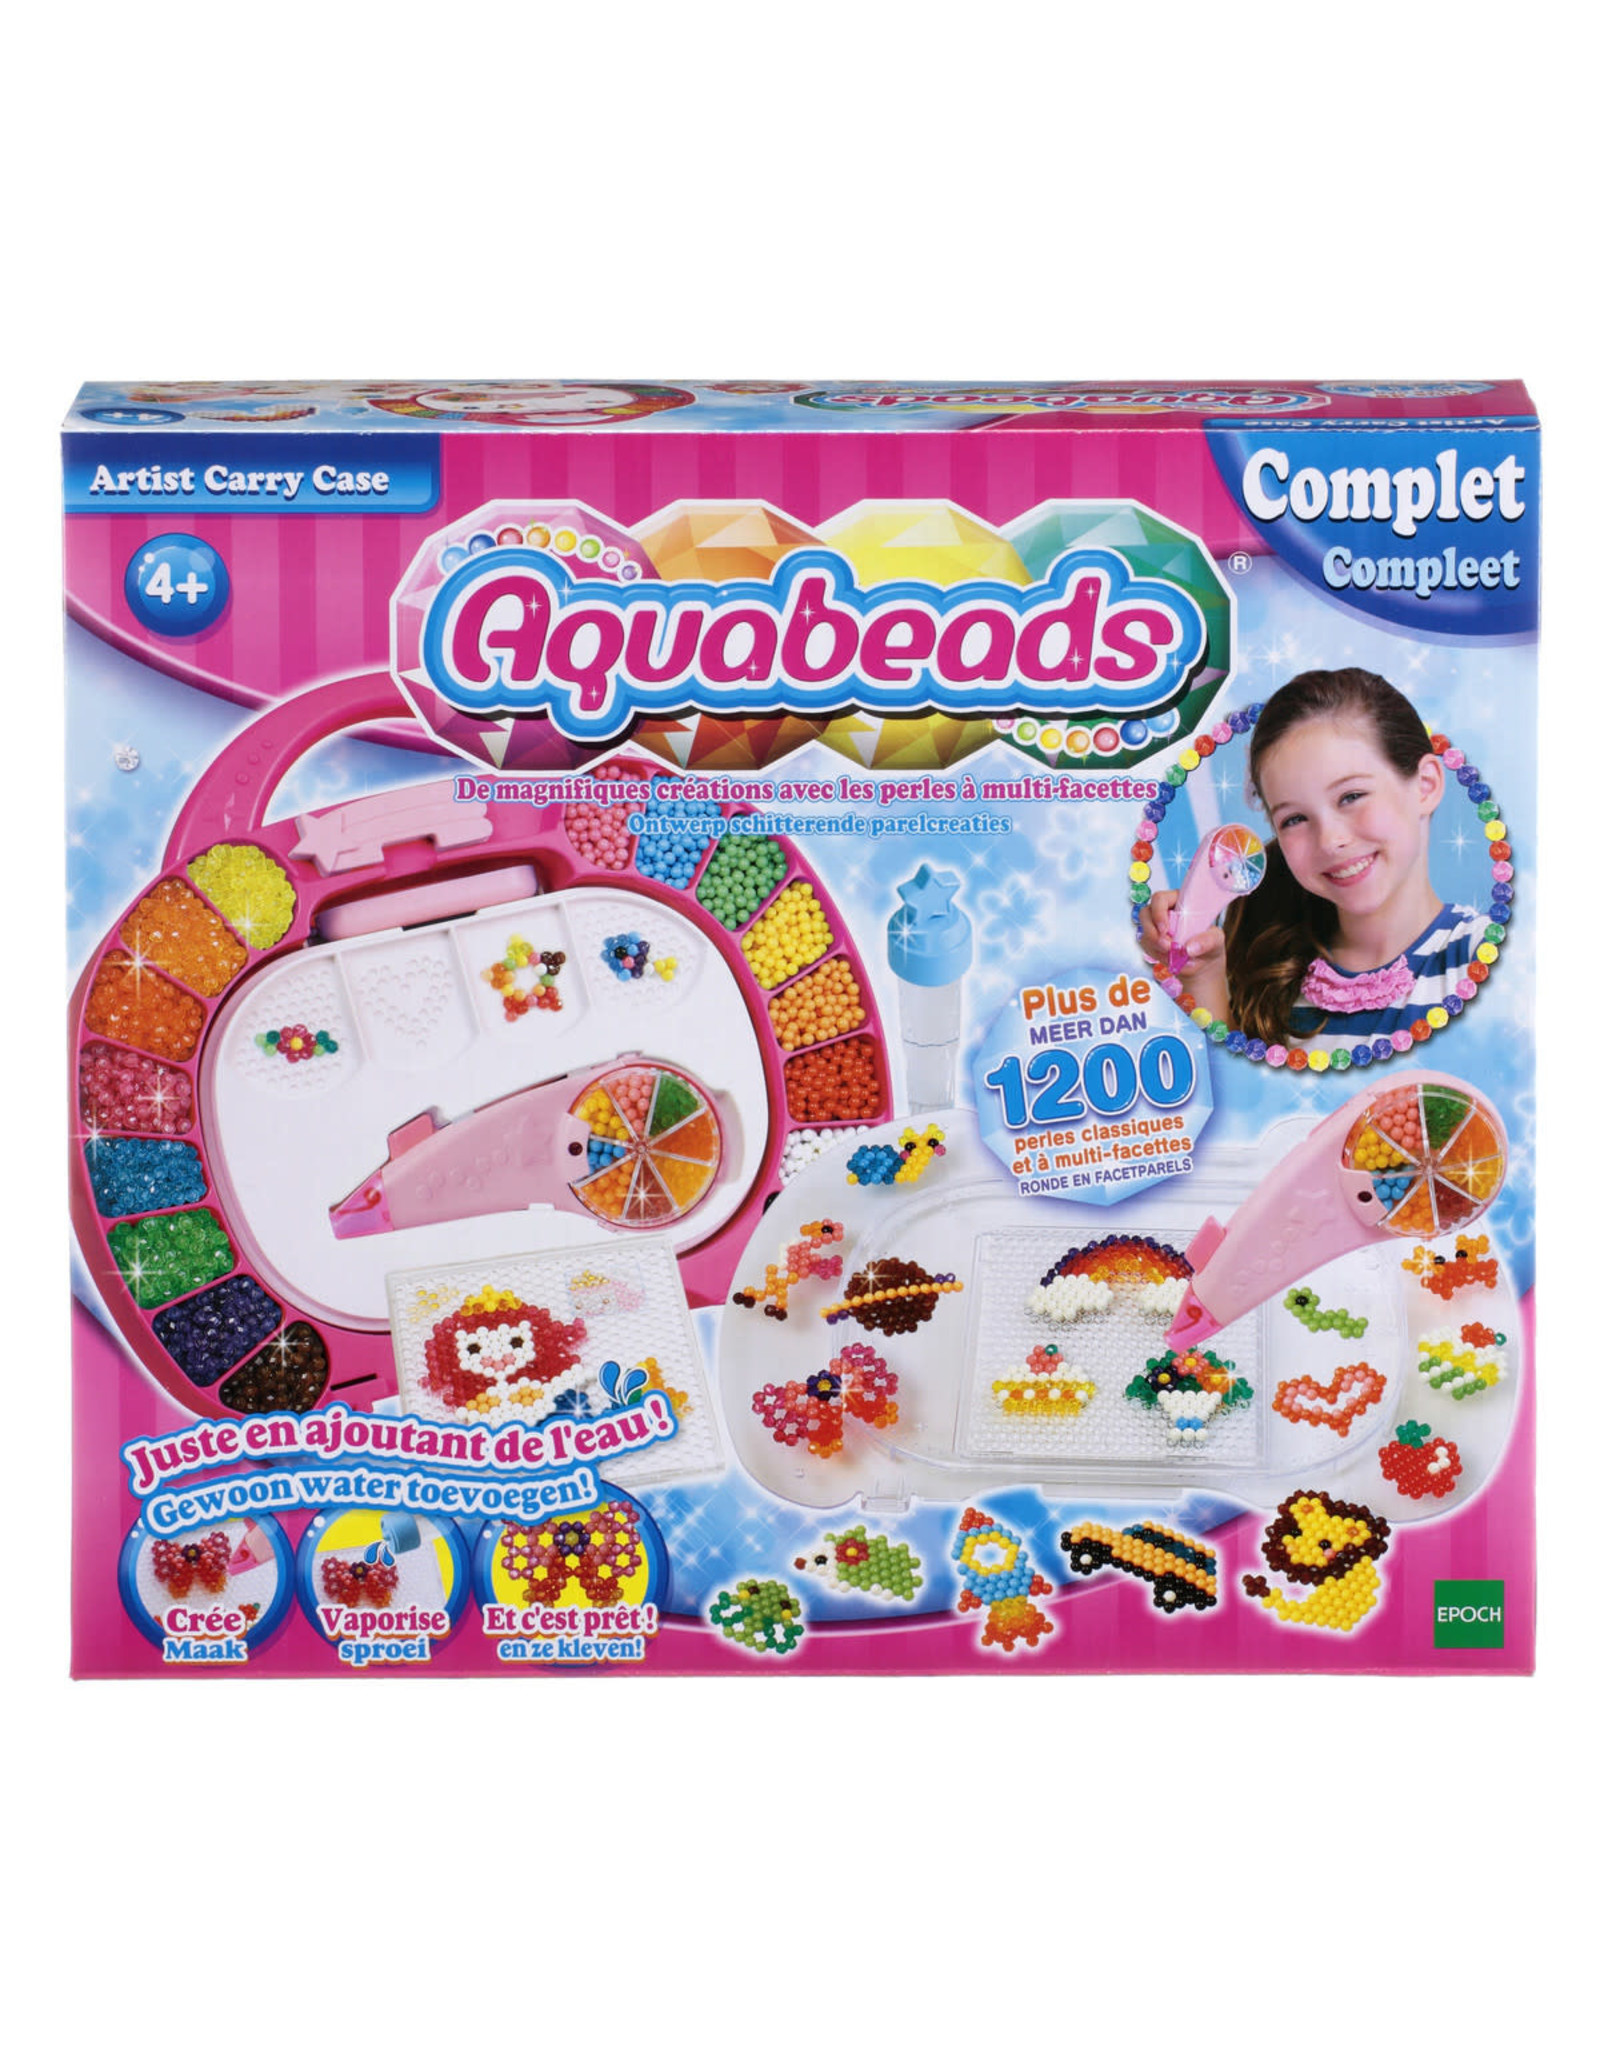 Epoch AquaBeads kunstenaarskoffertje 31229